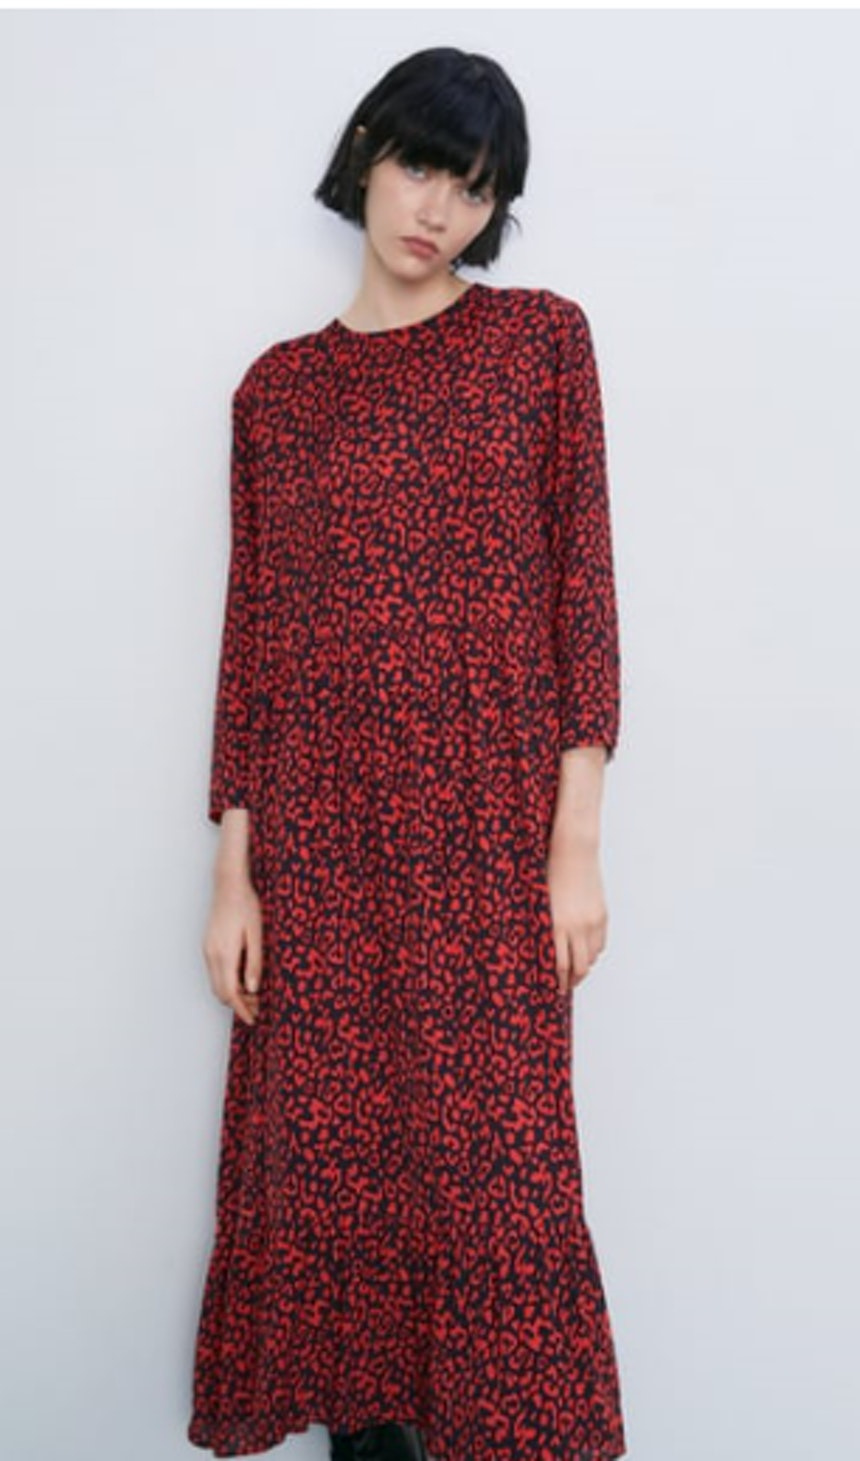 Autumn Style Advice: Extending The Life Of The Midi Dress